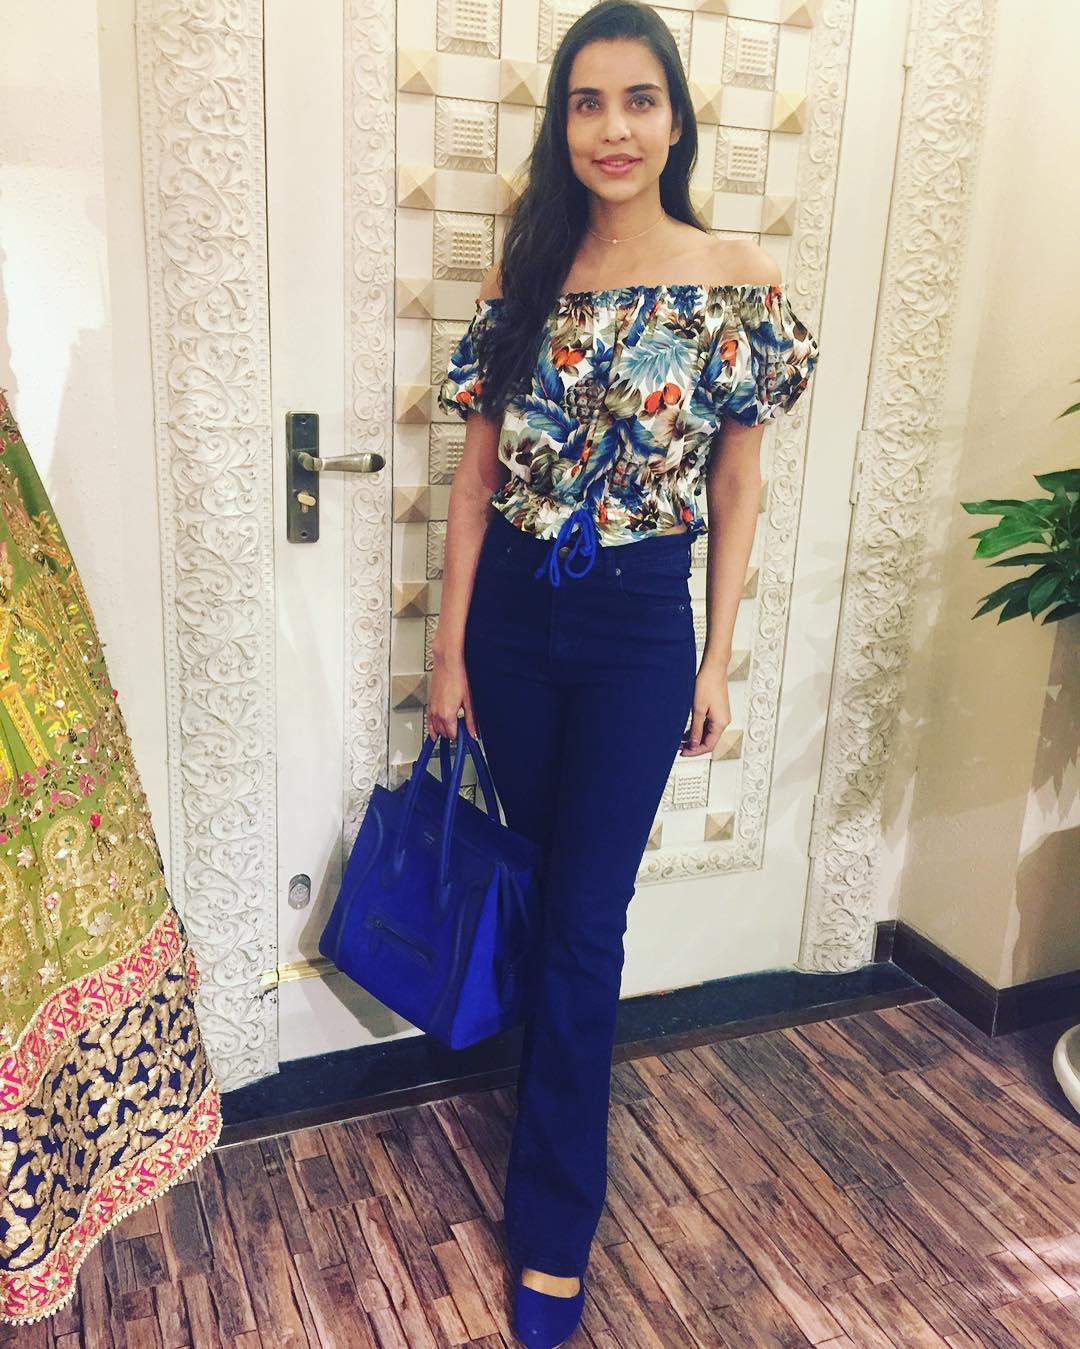 Model and Actress Sana Safraz at her Dream Engagement in Dubai